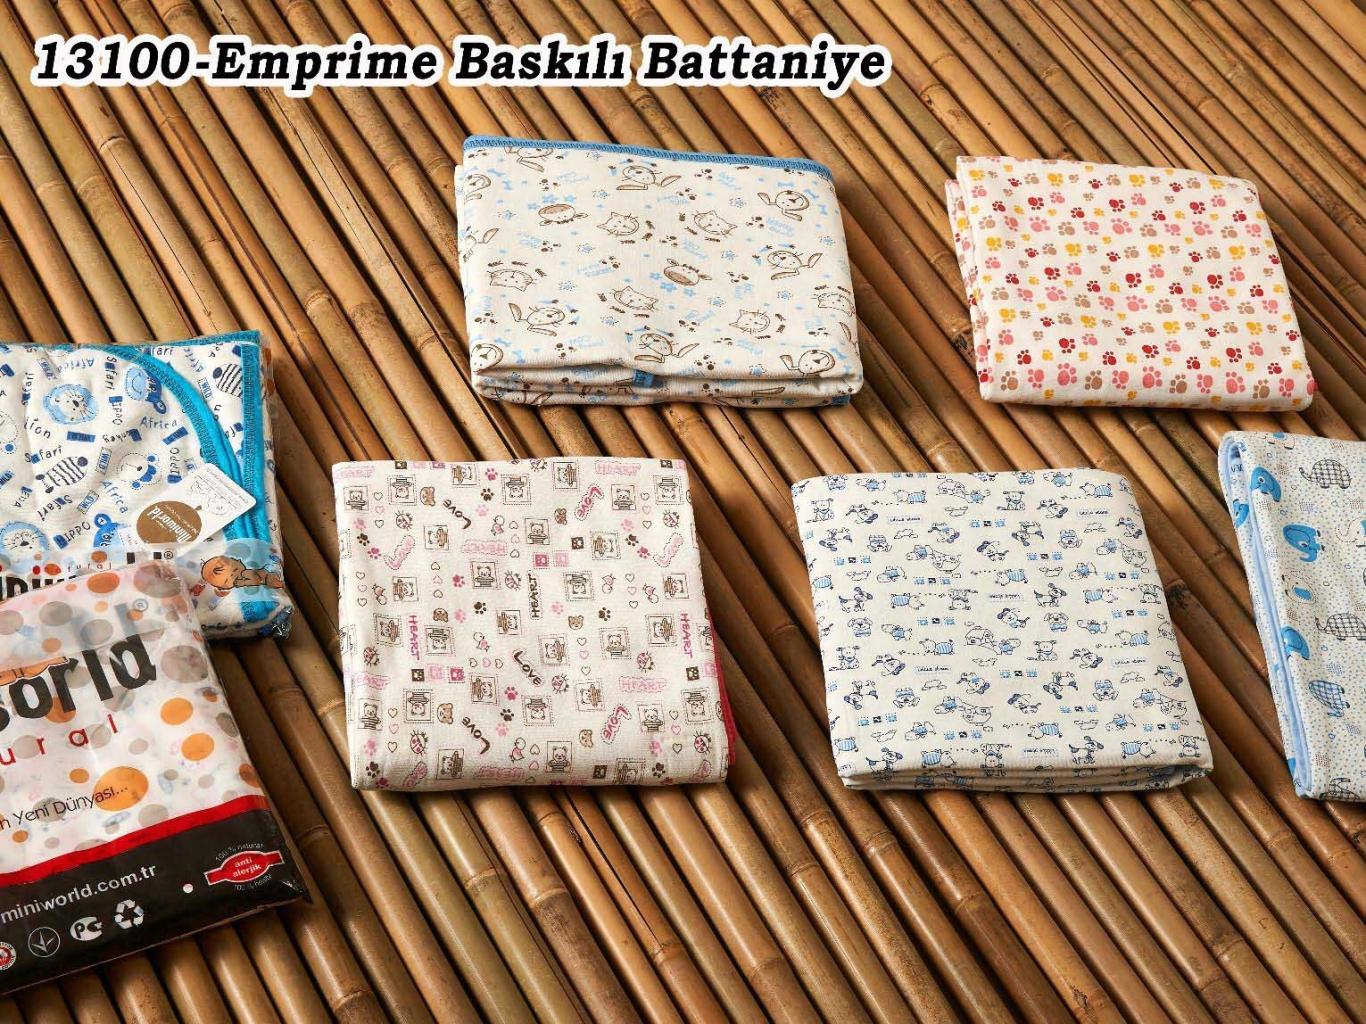 EMPİRME BASKILI BATTANİYE 13100